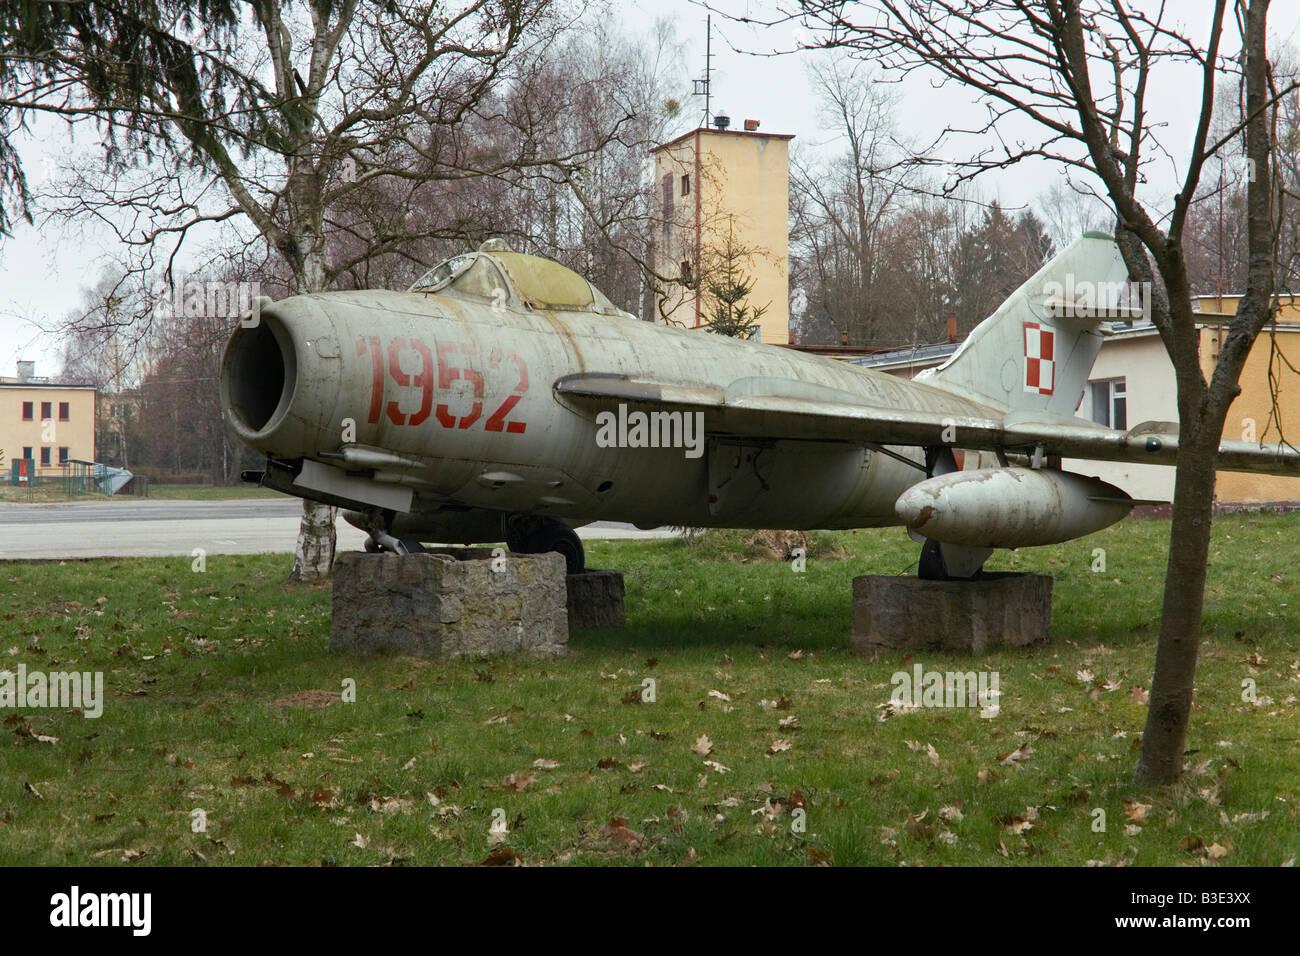 Ex-Soviet and Polish military base in Redzikowo, Poland where the U.S. wants to base 10 interceptor missiles. - Stock Image